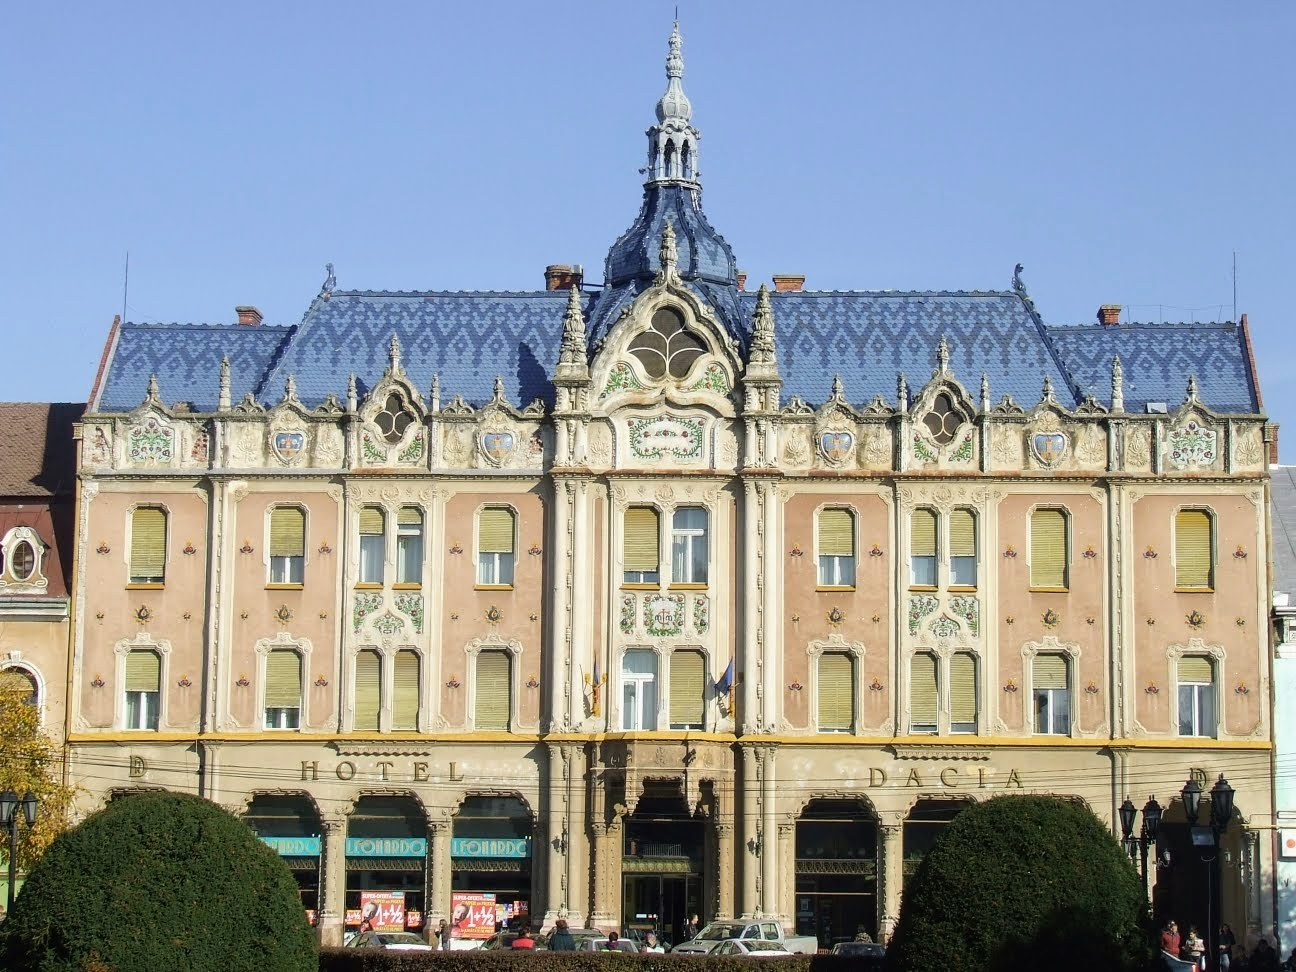 Hotel_Dacia,_Satu_Mare_Romania_1.jpg